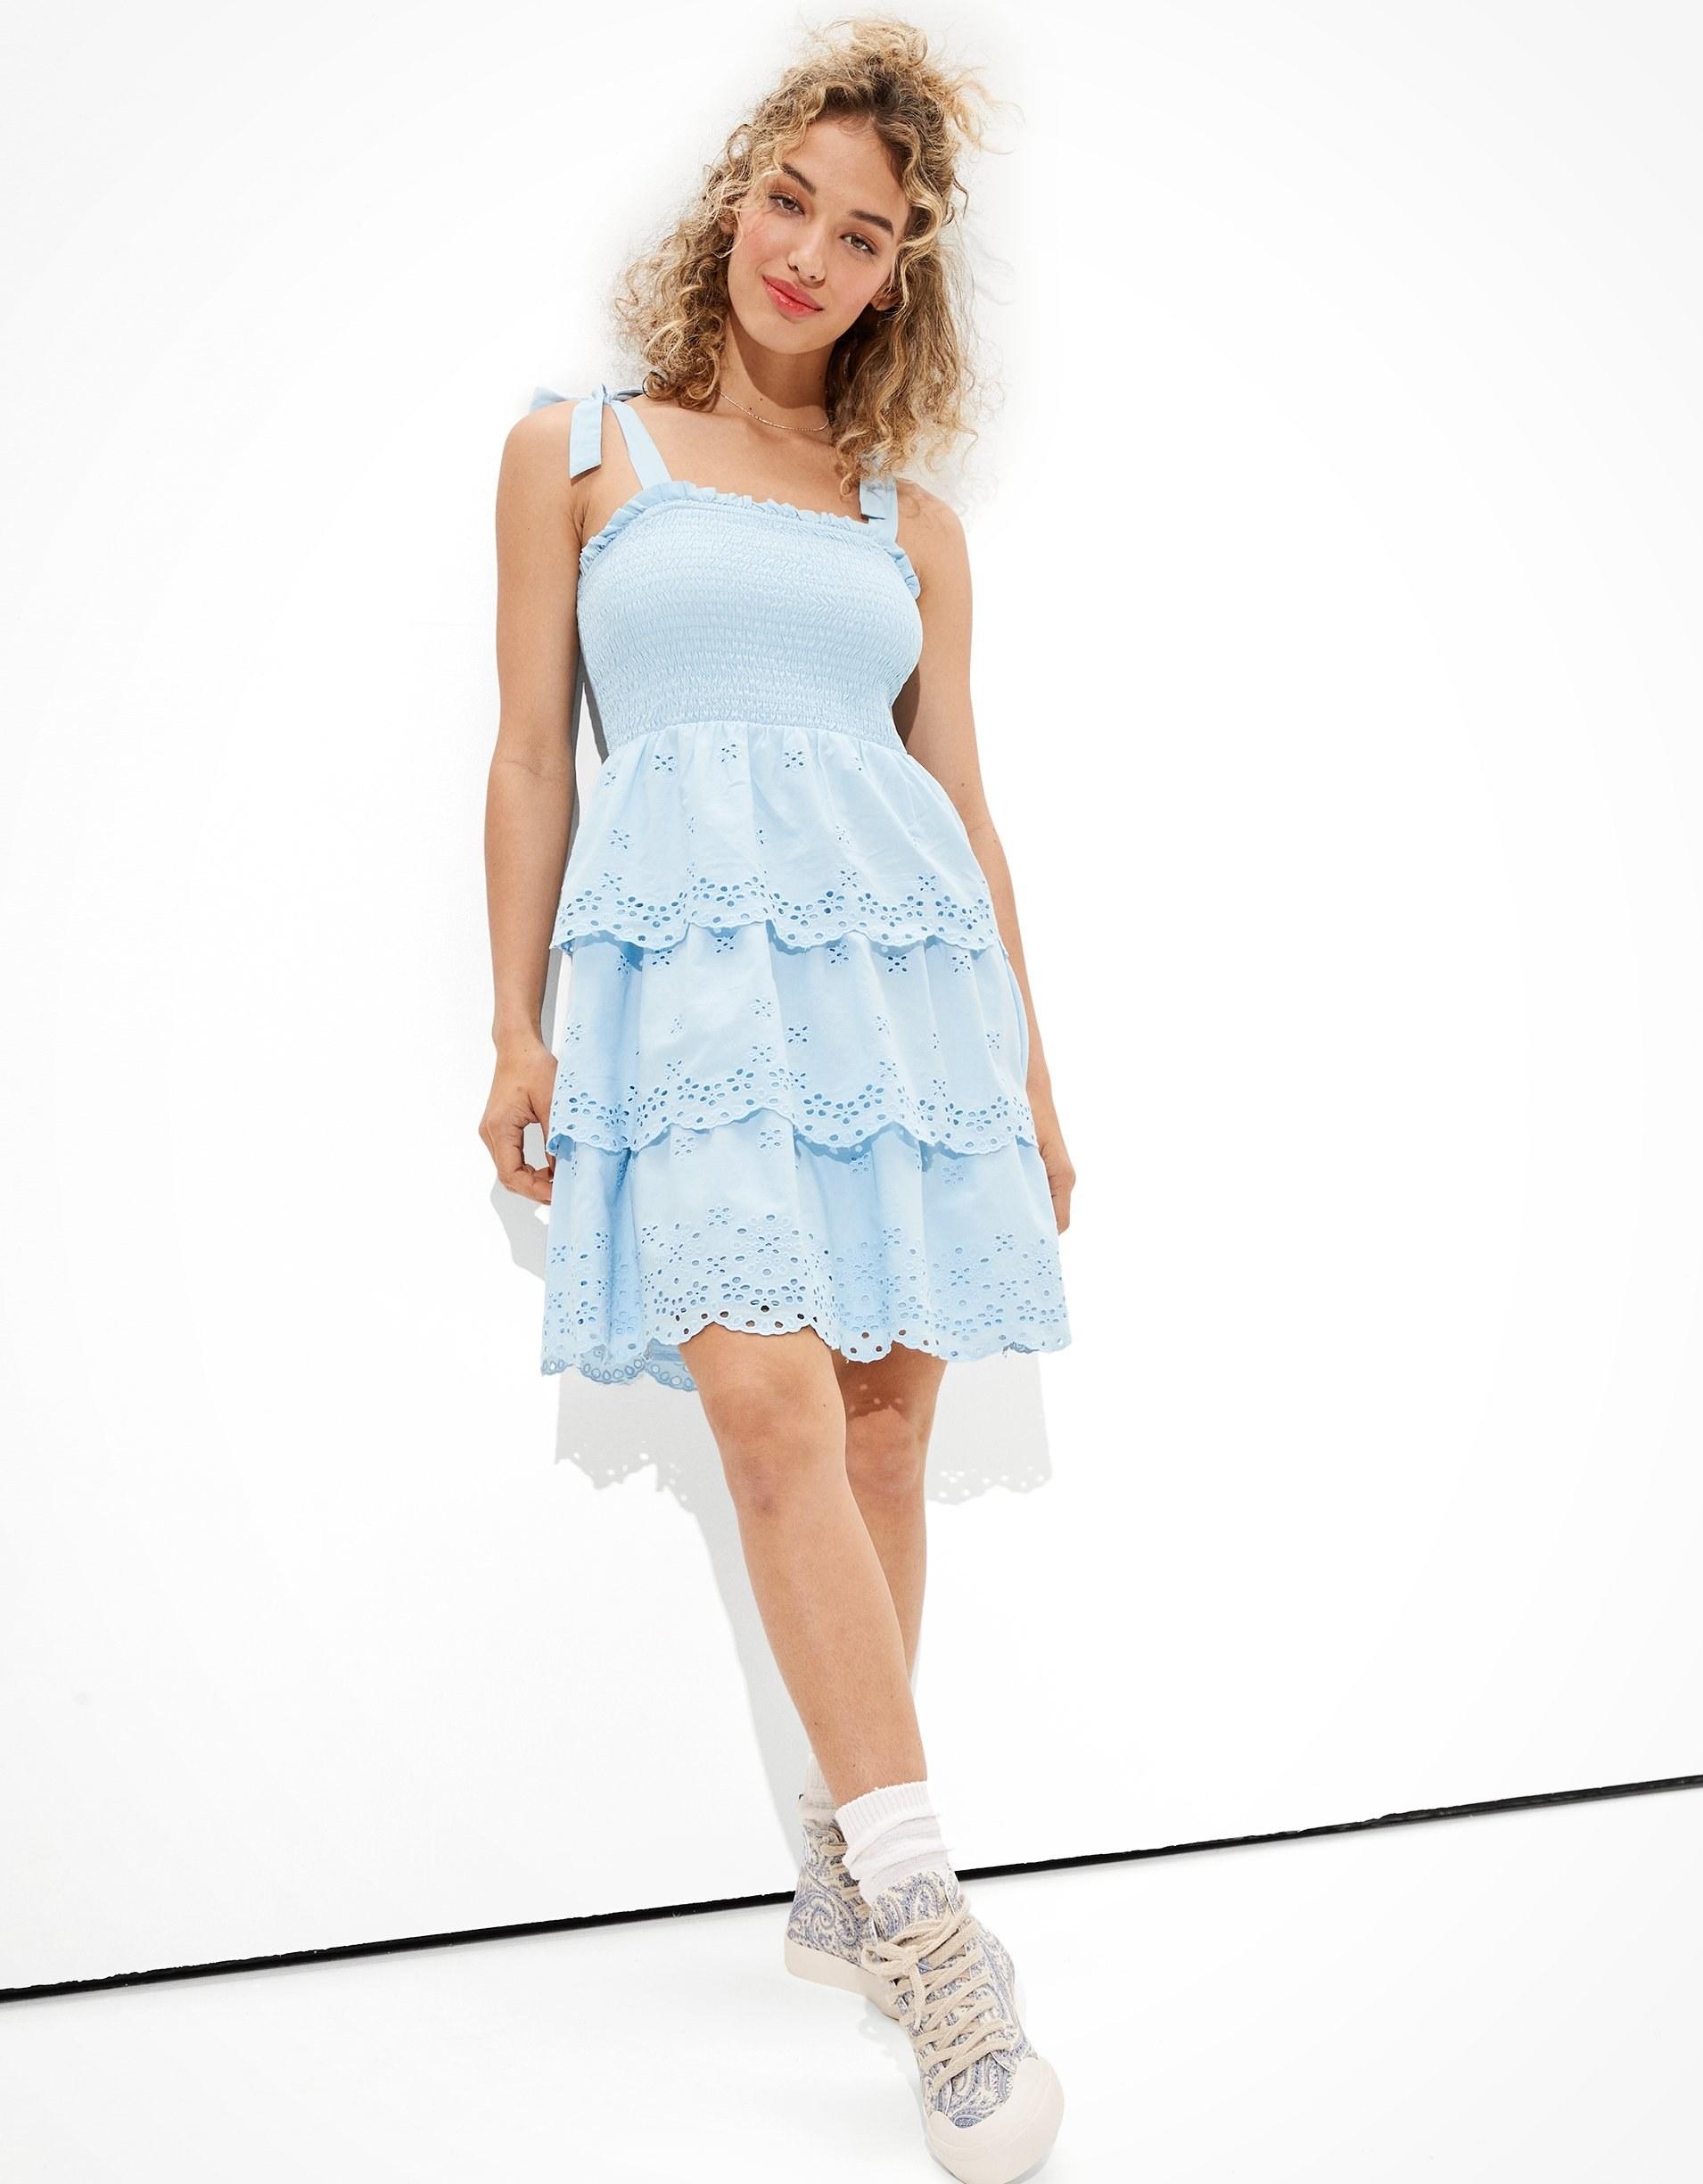 tank dress with three tier skirt